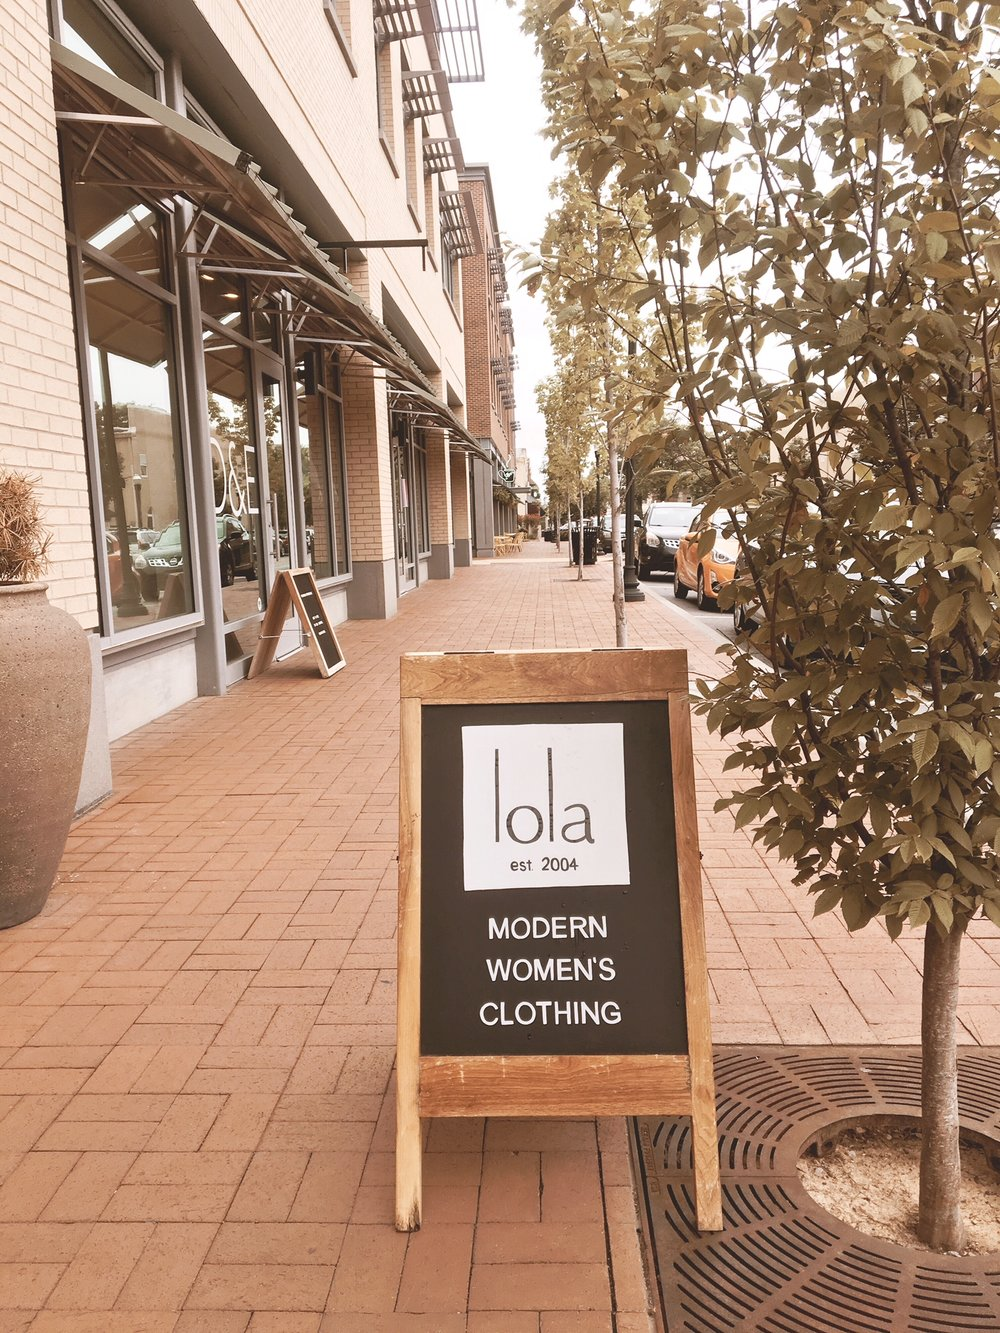 lola (omg fashionistas, go here)